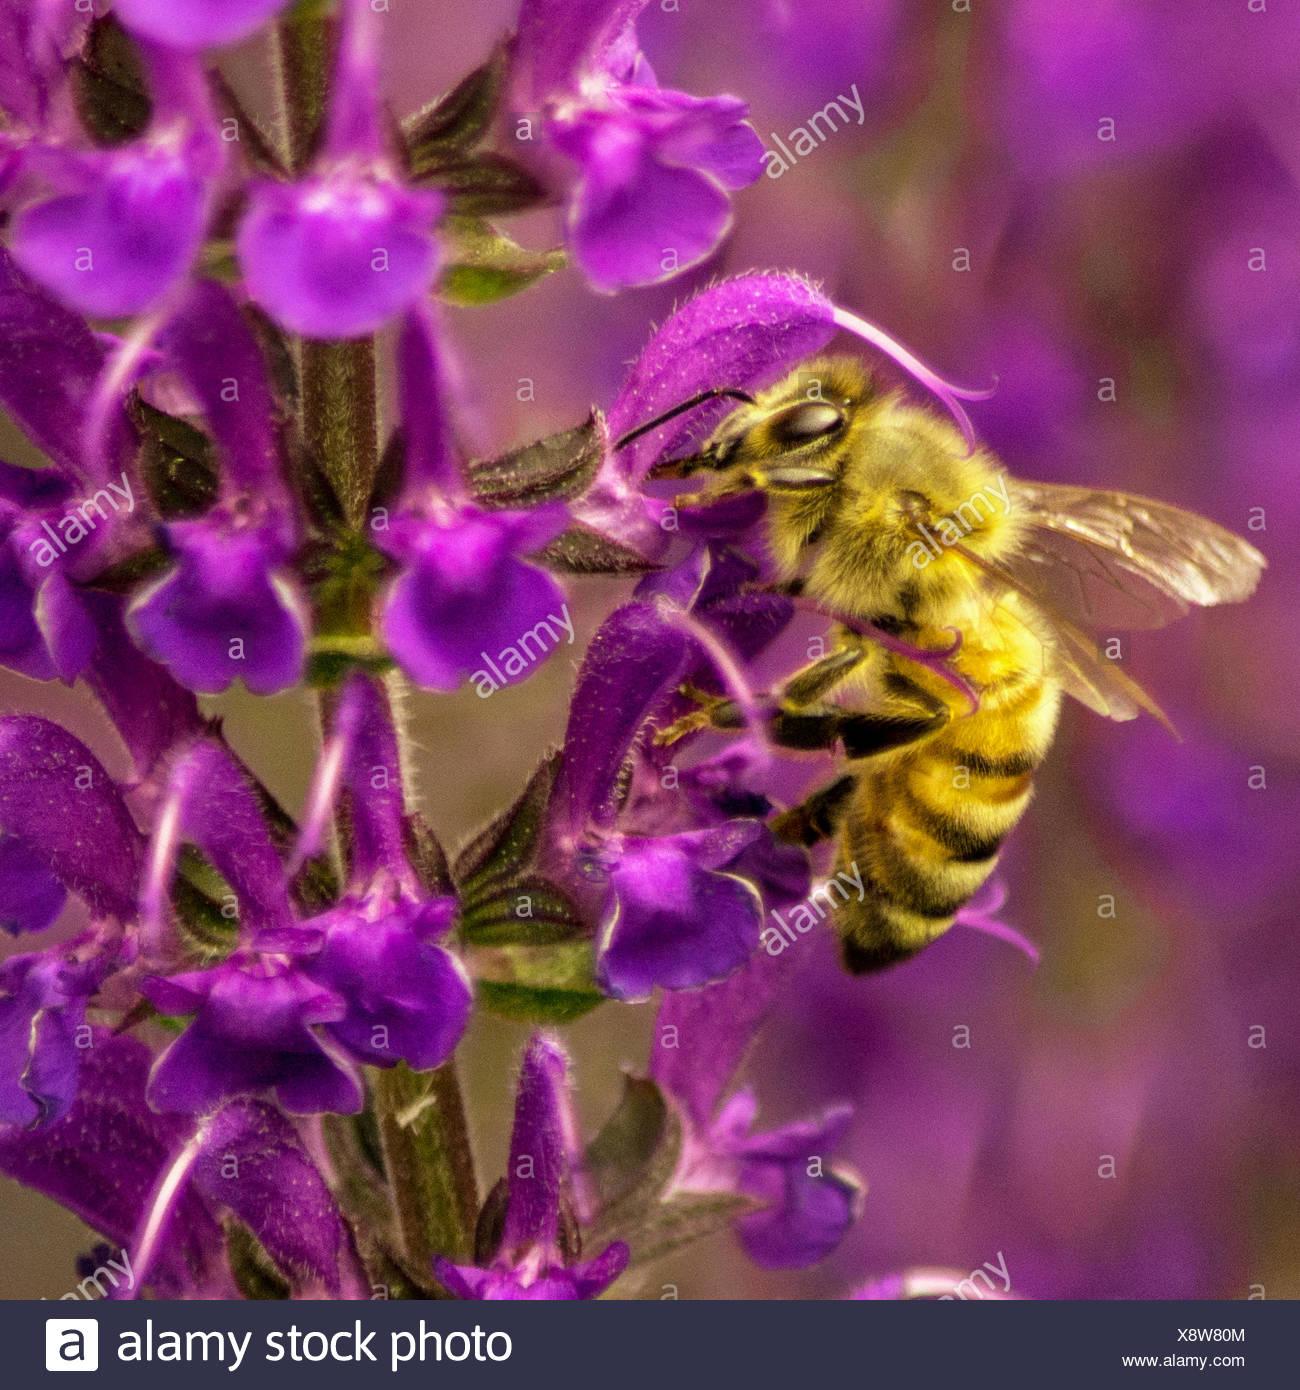 USA, Colorado, Biene in Mitternacht Salvie Stockbild